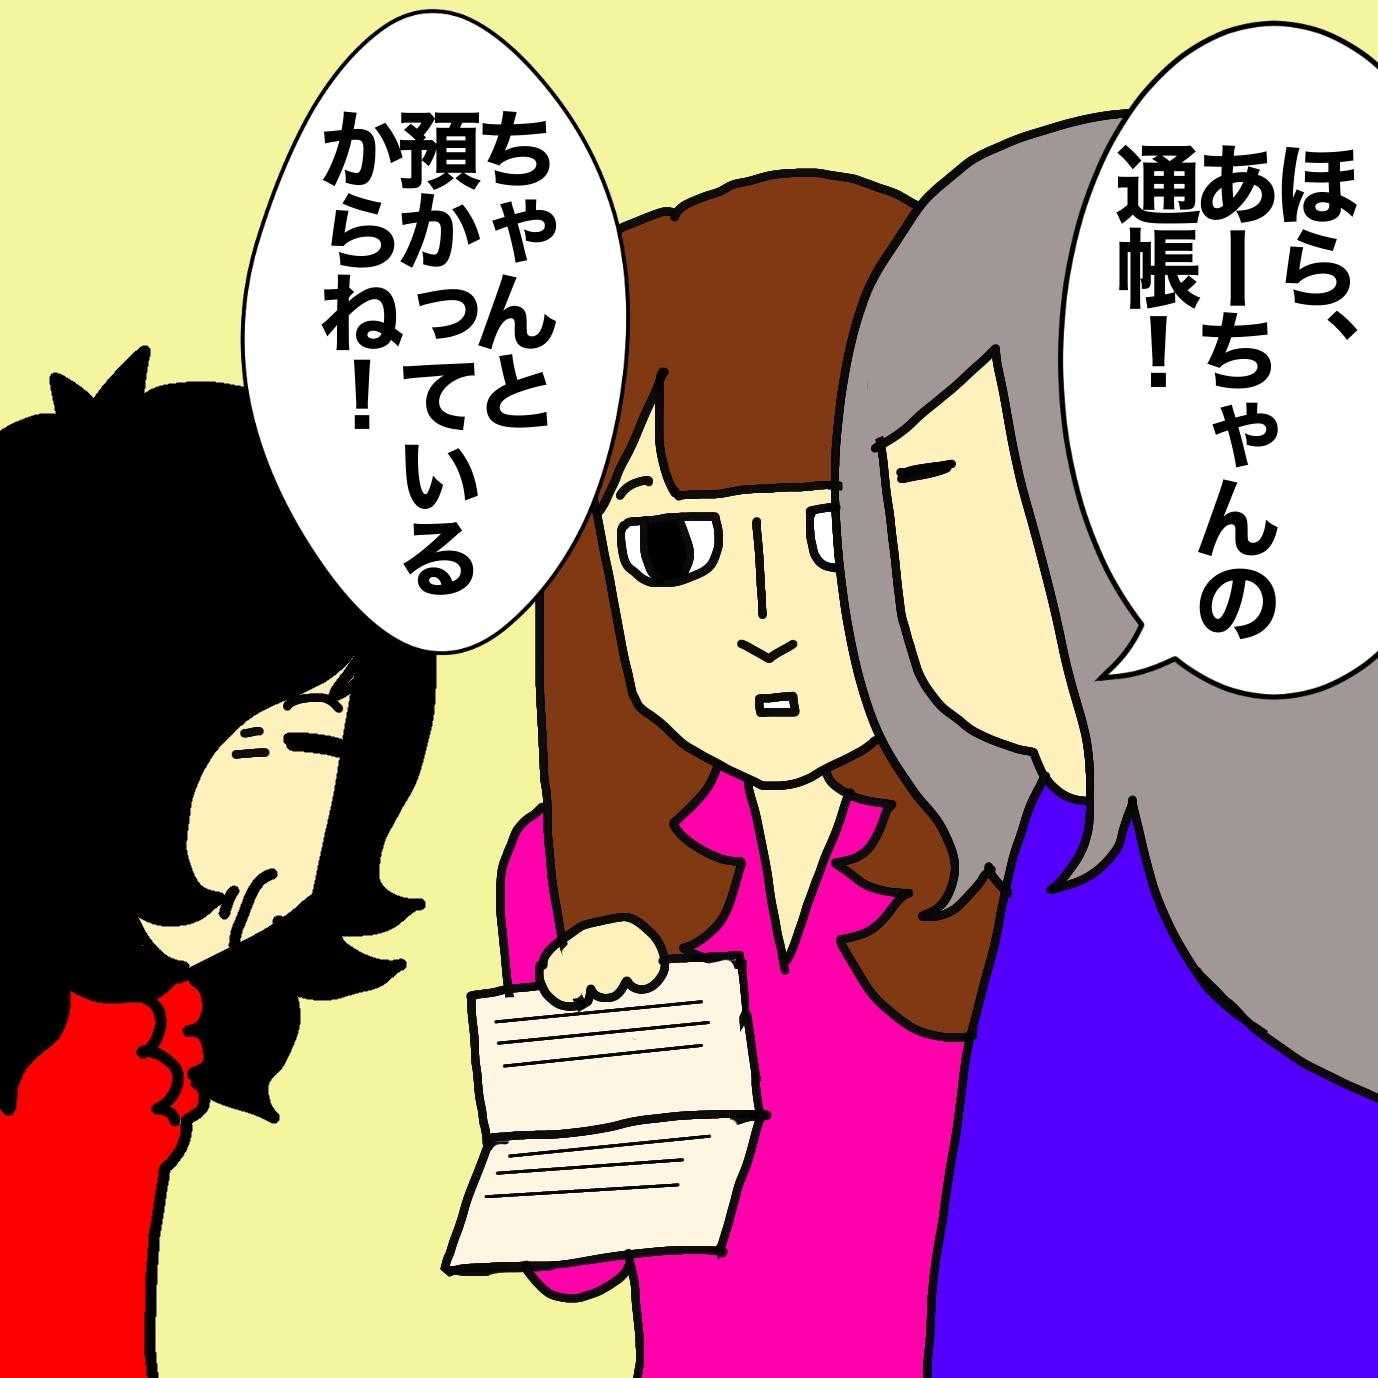 Image (1).jpeg